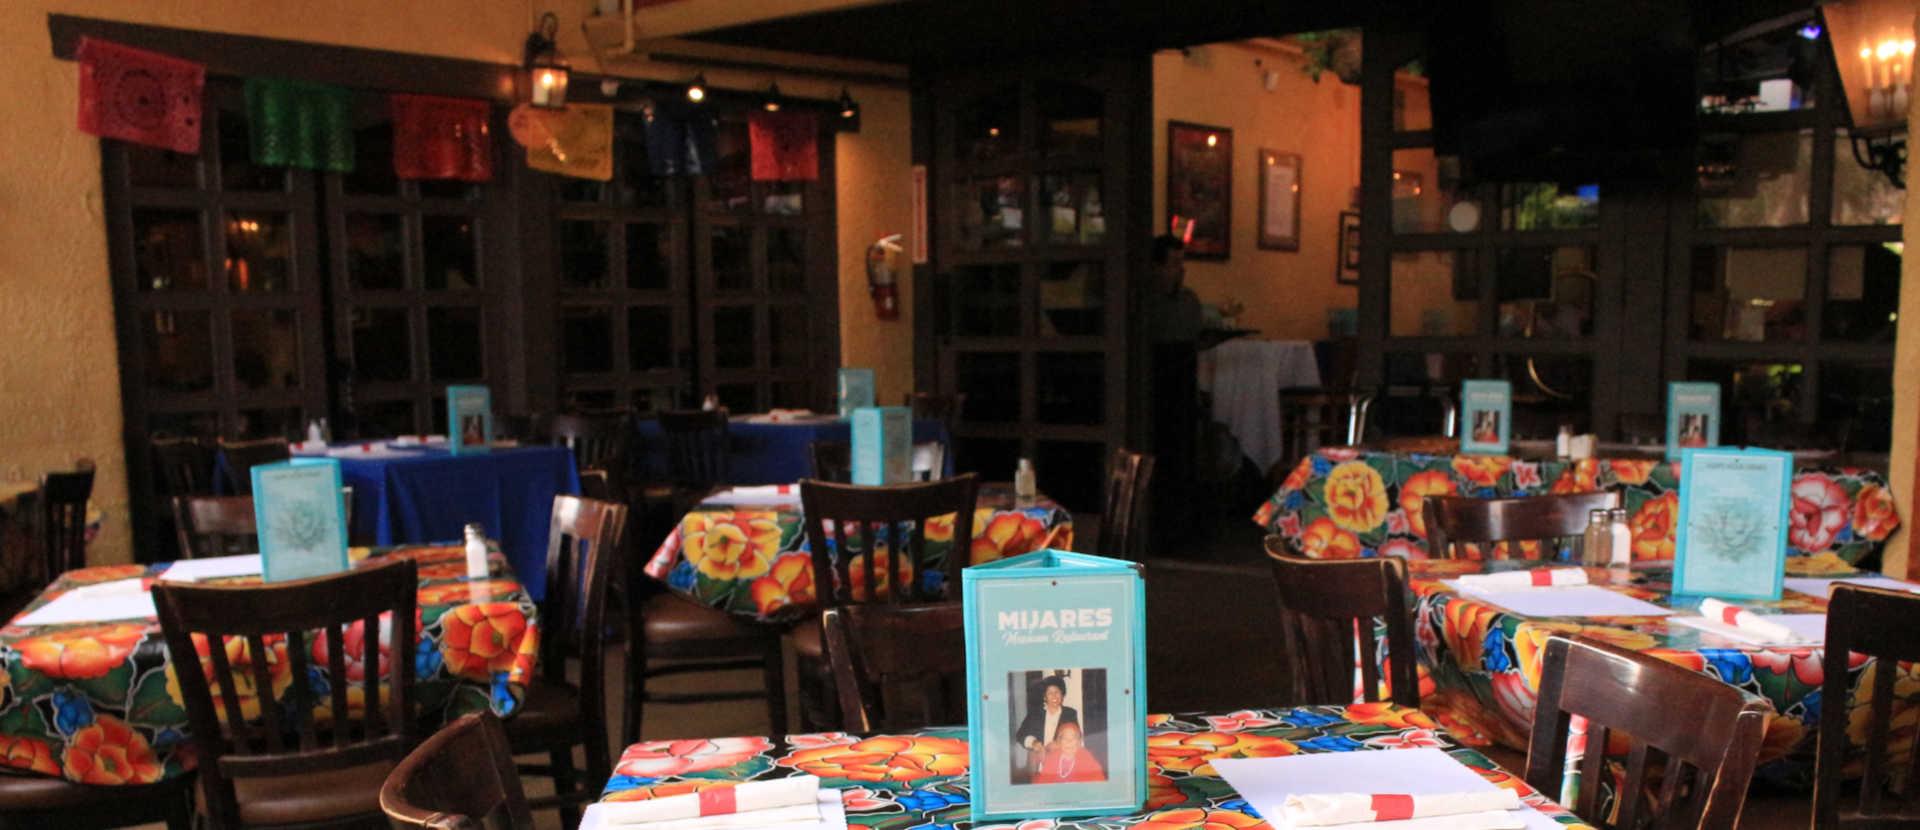 Mijares Mexican Restaurant Pasadena